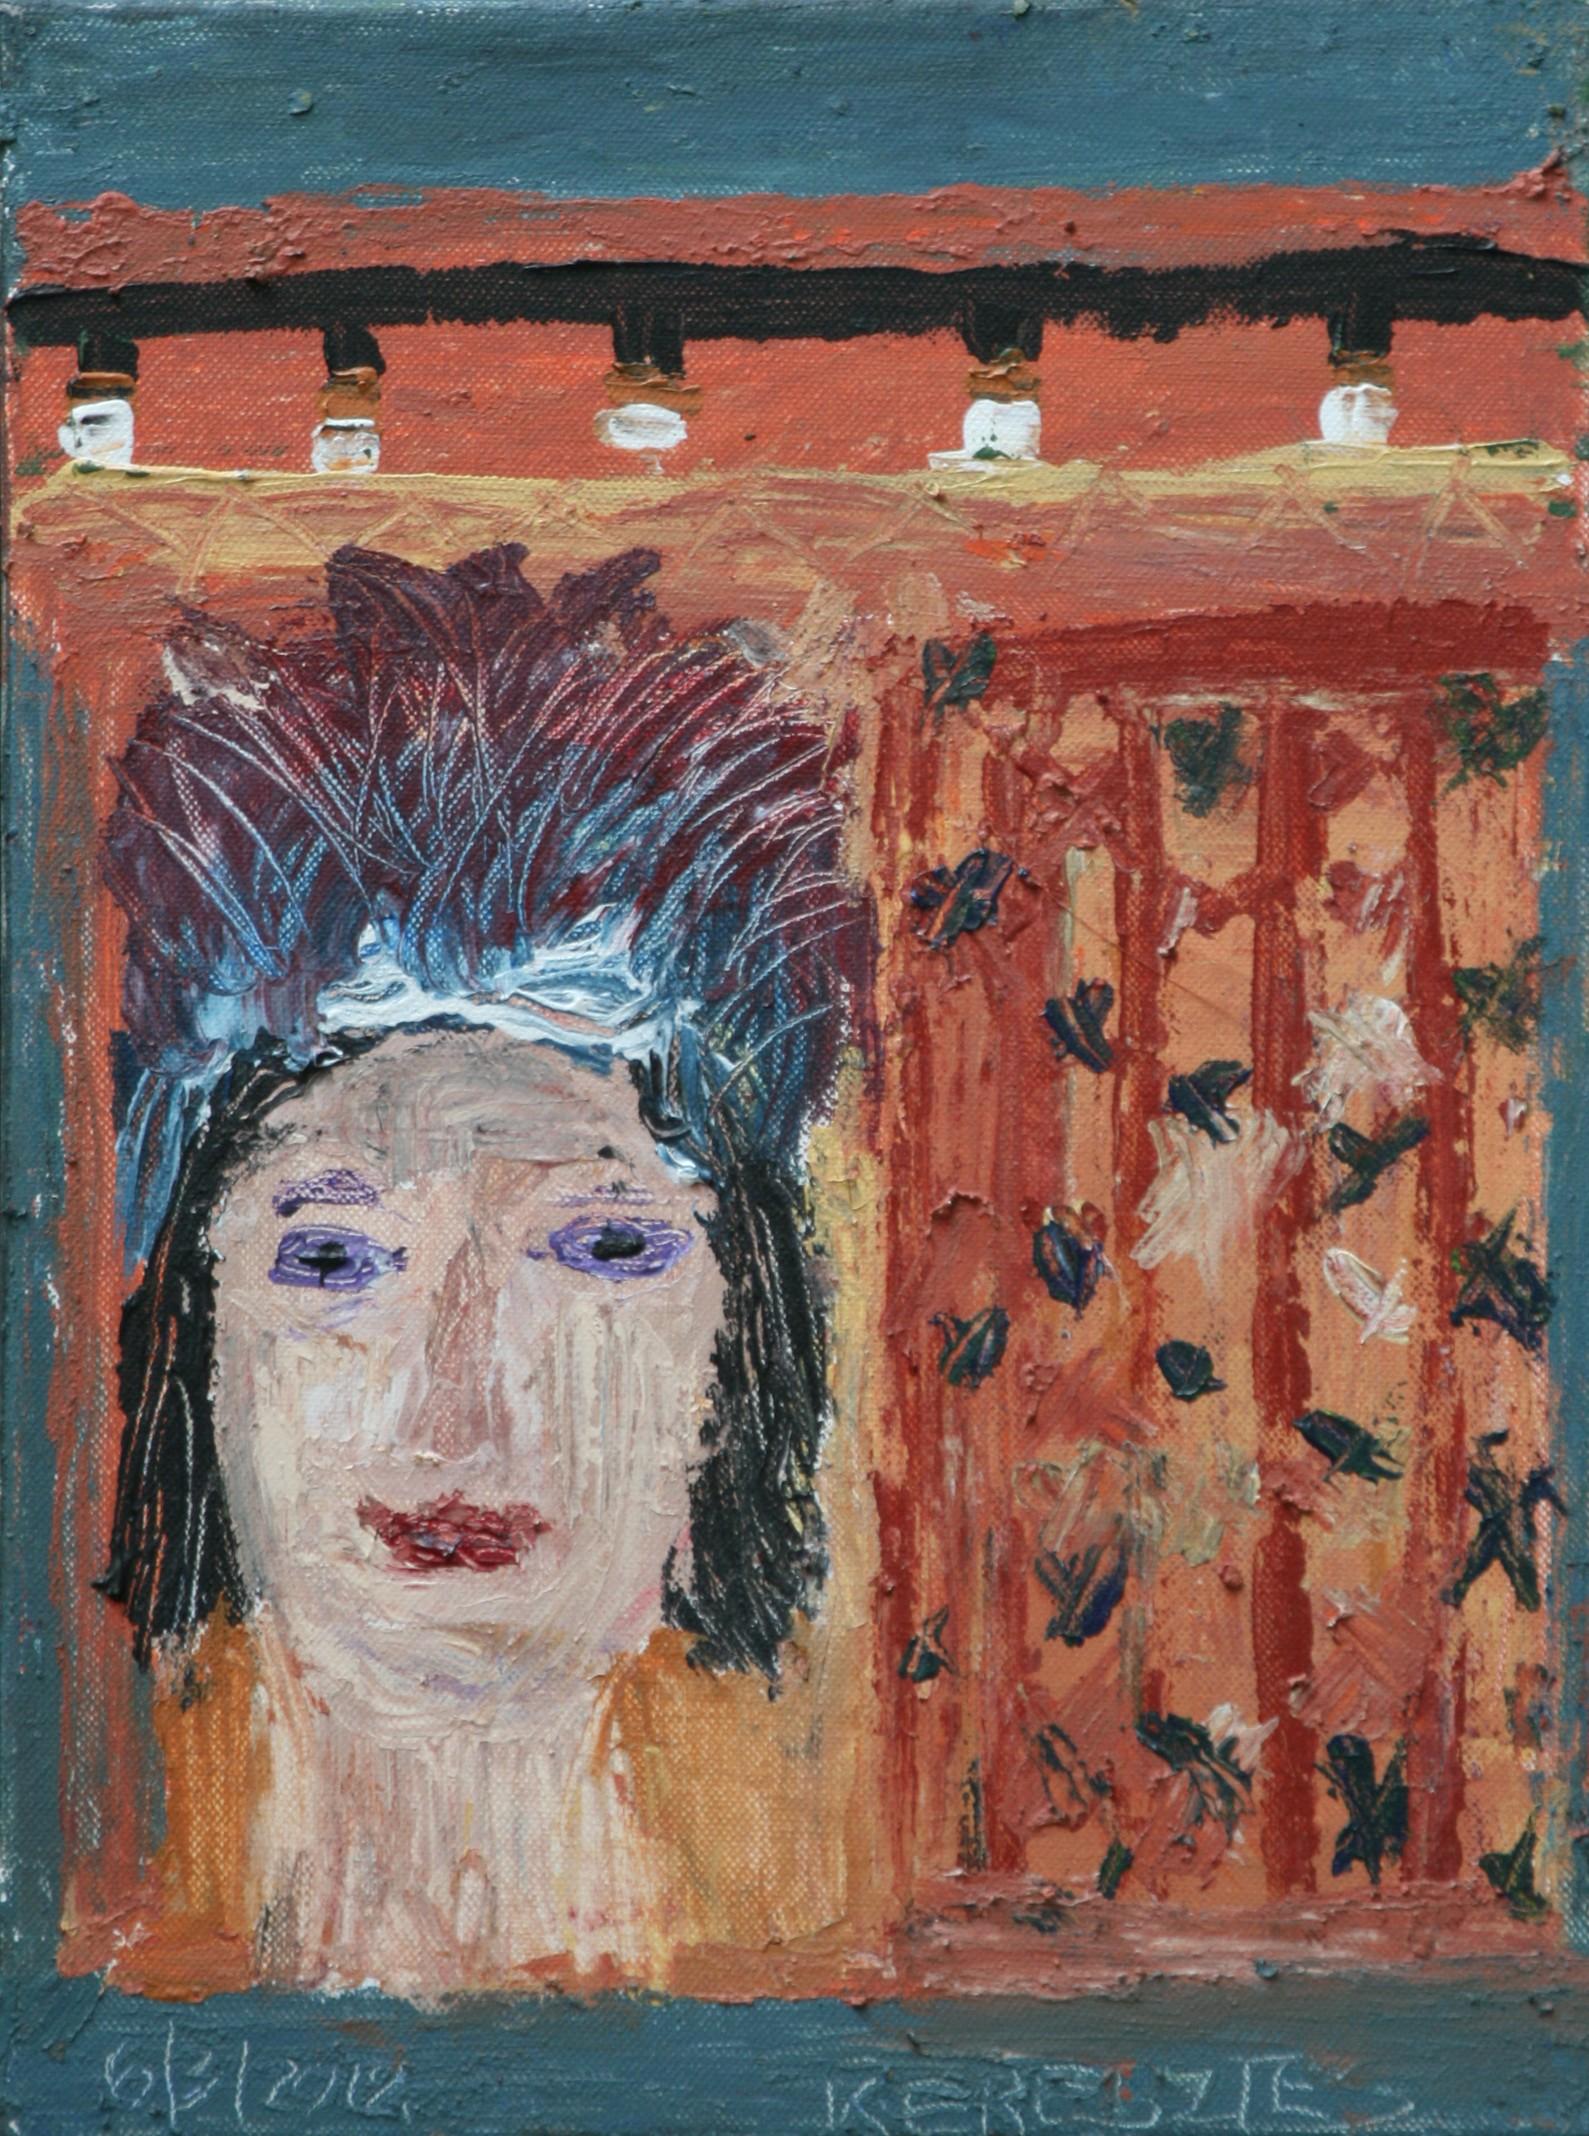 toile 20 - magdalena keresztes, artiste peintre à amiens